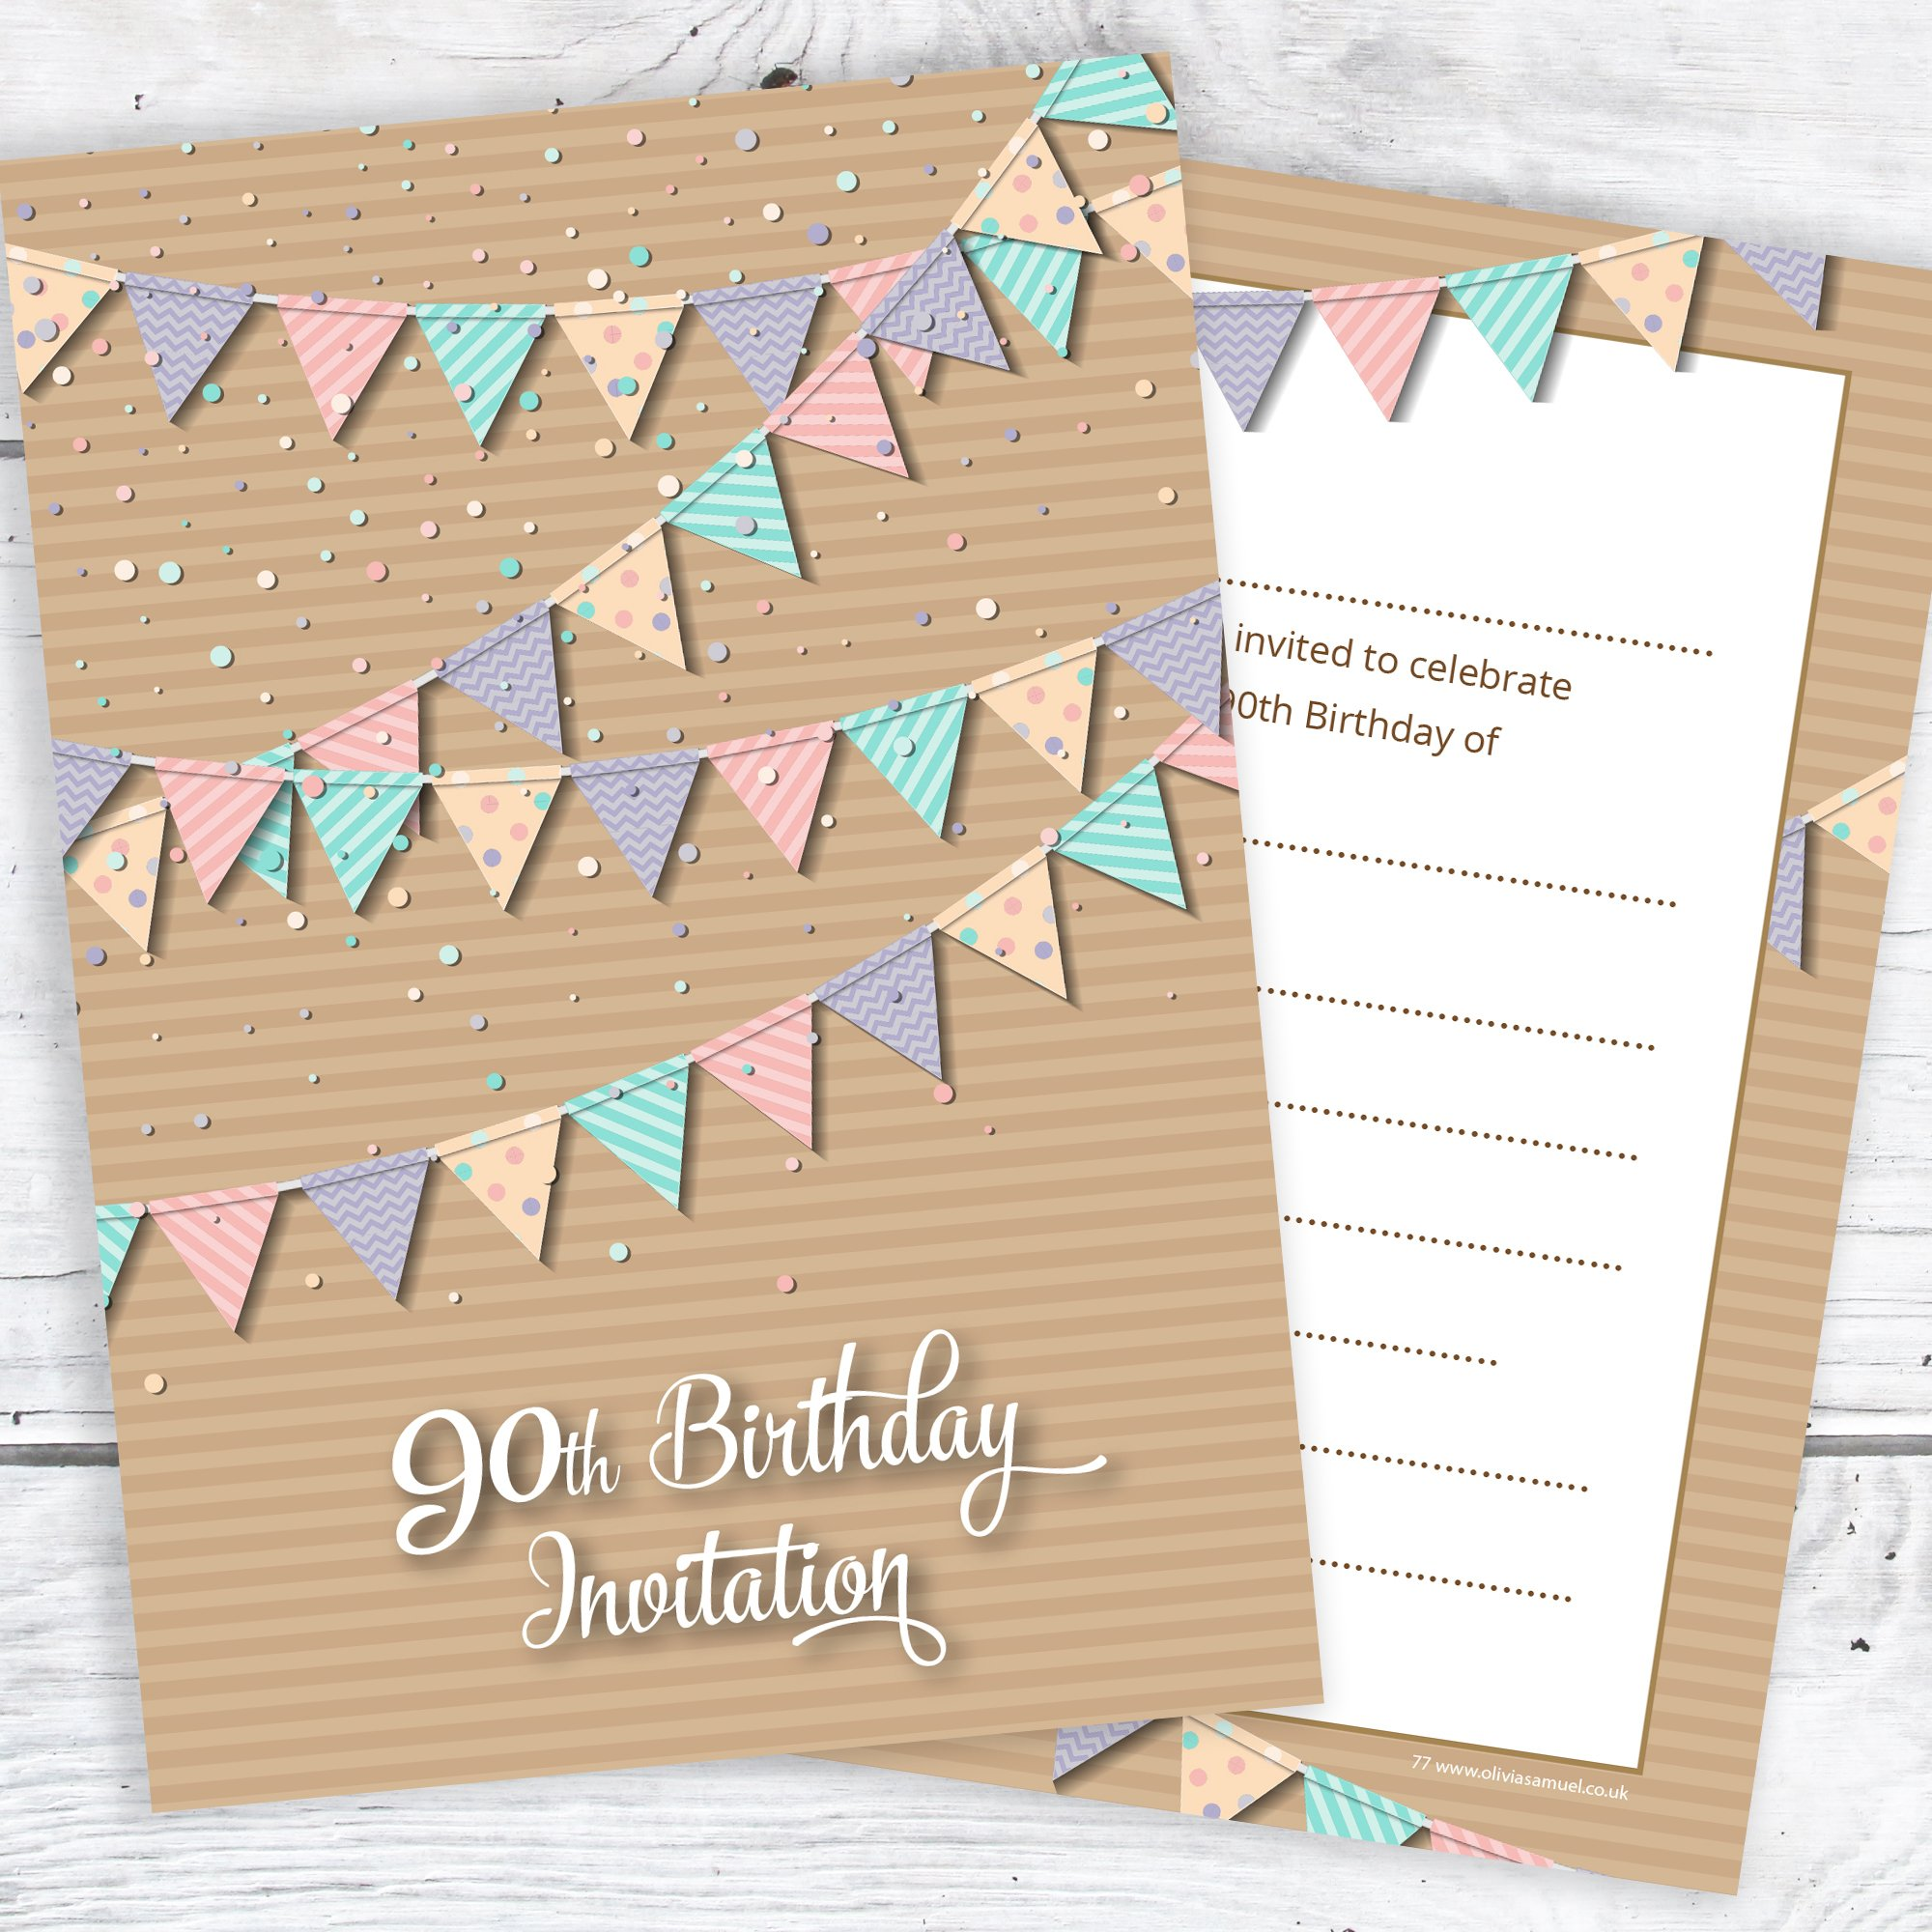 90th Birthday Invitations: Amazon.co.uk